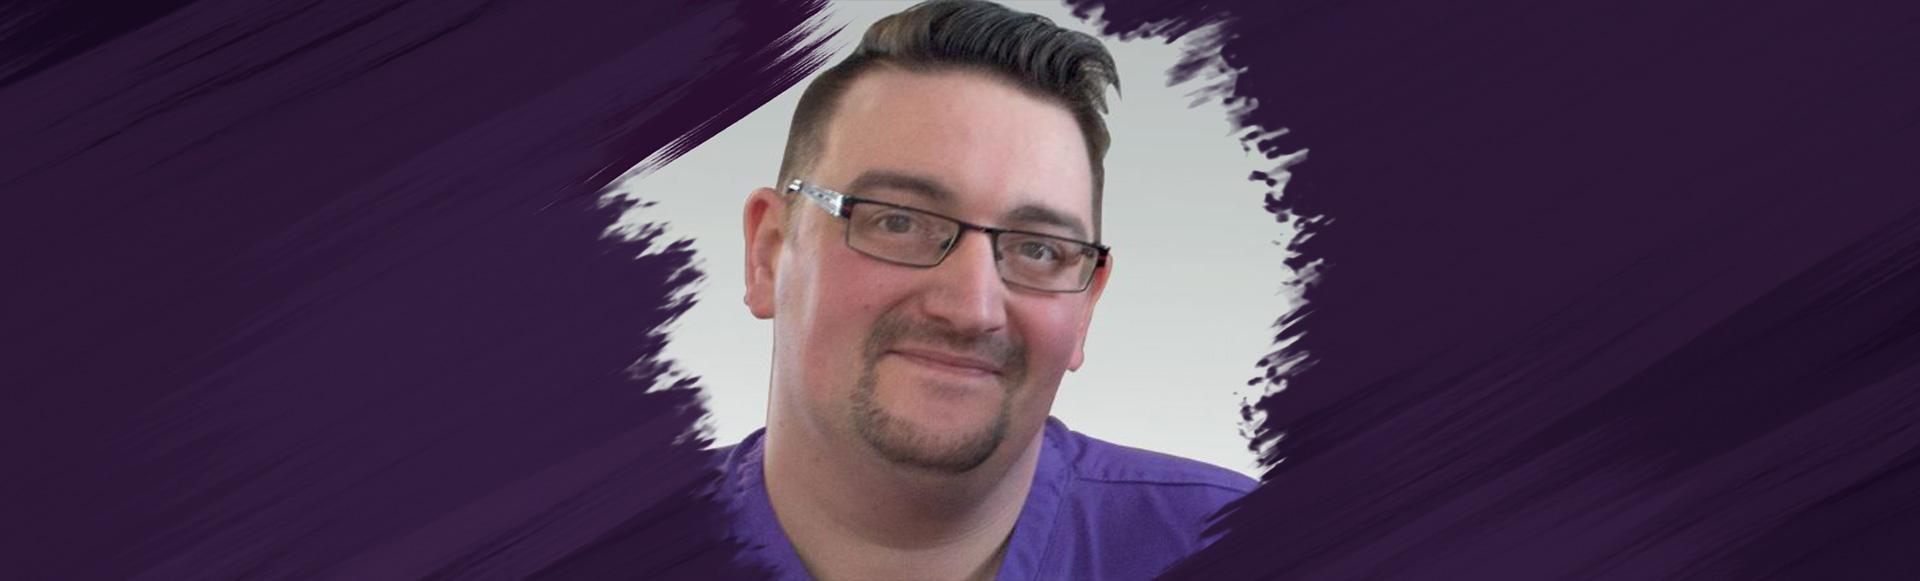 <span class='customfont'>Matthew </span> loves his job as a nursing care assistant